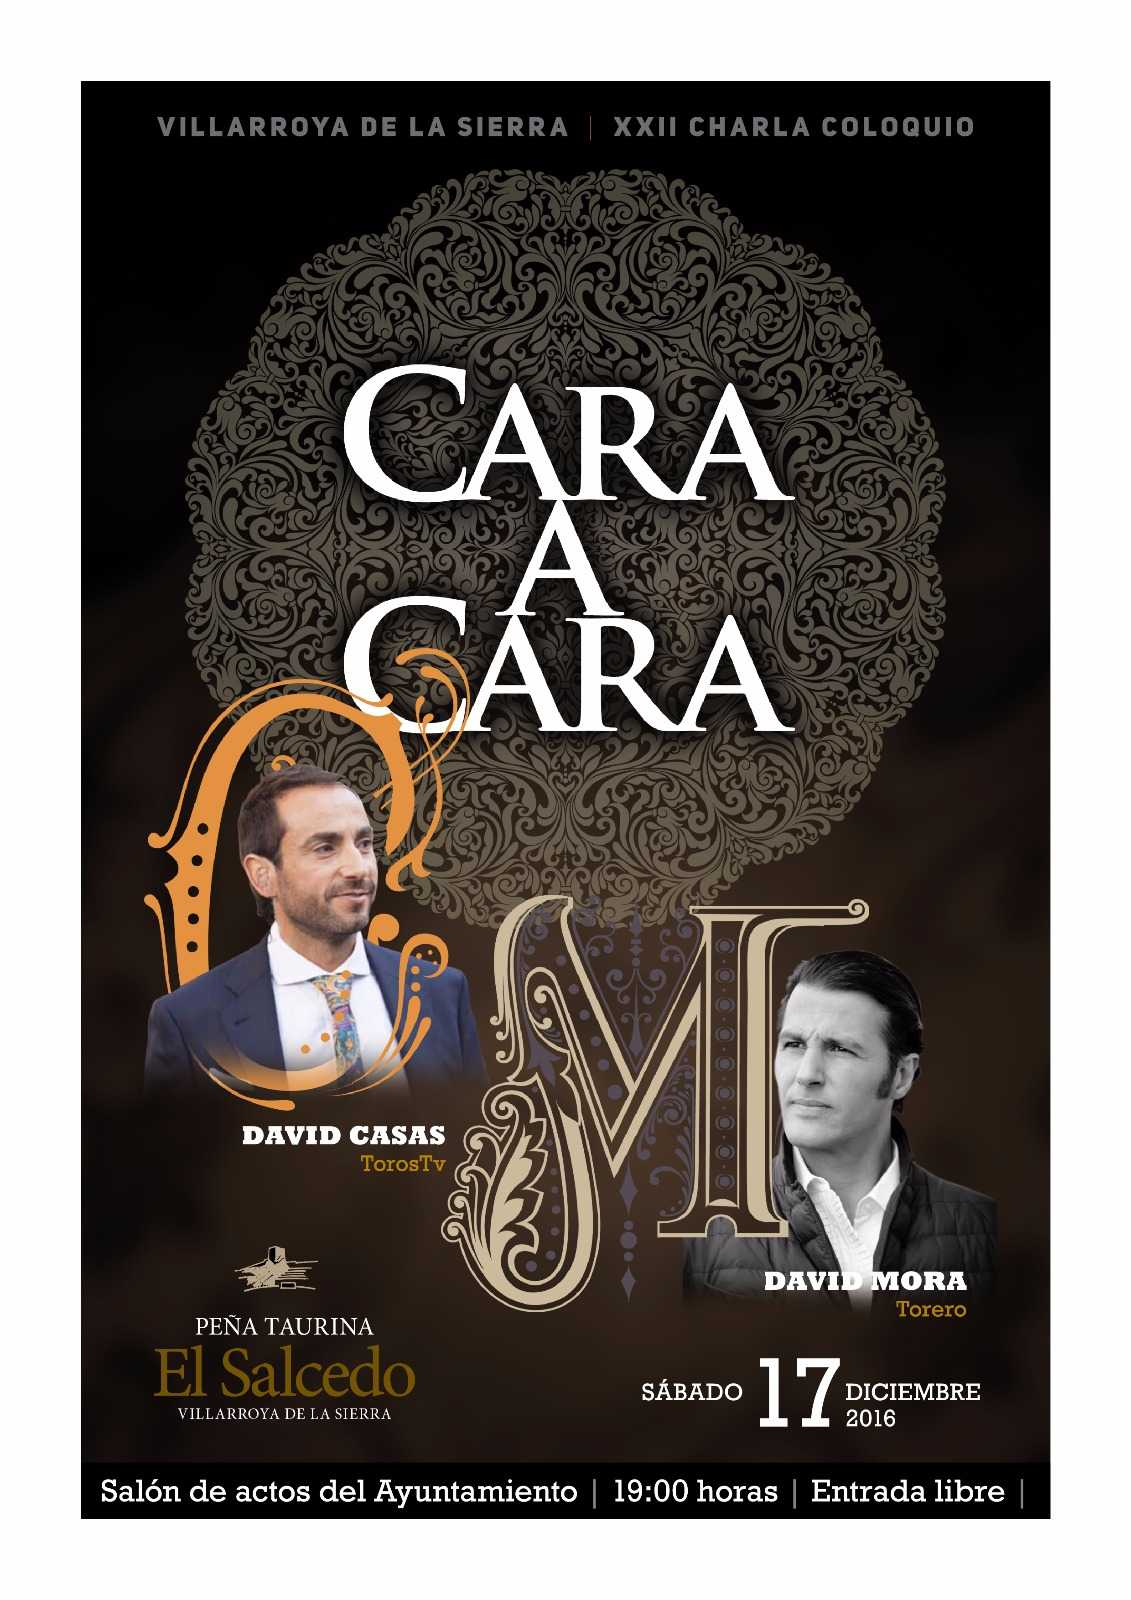 2016XXIICHARLA-Caracara